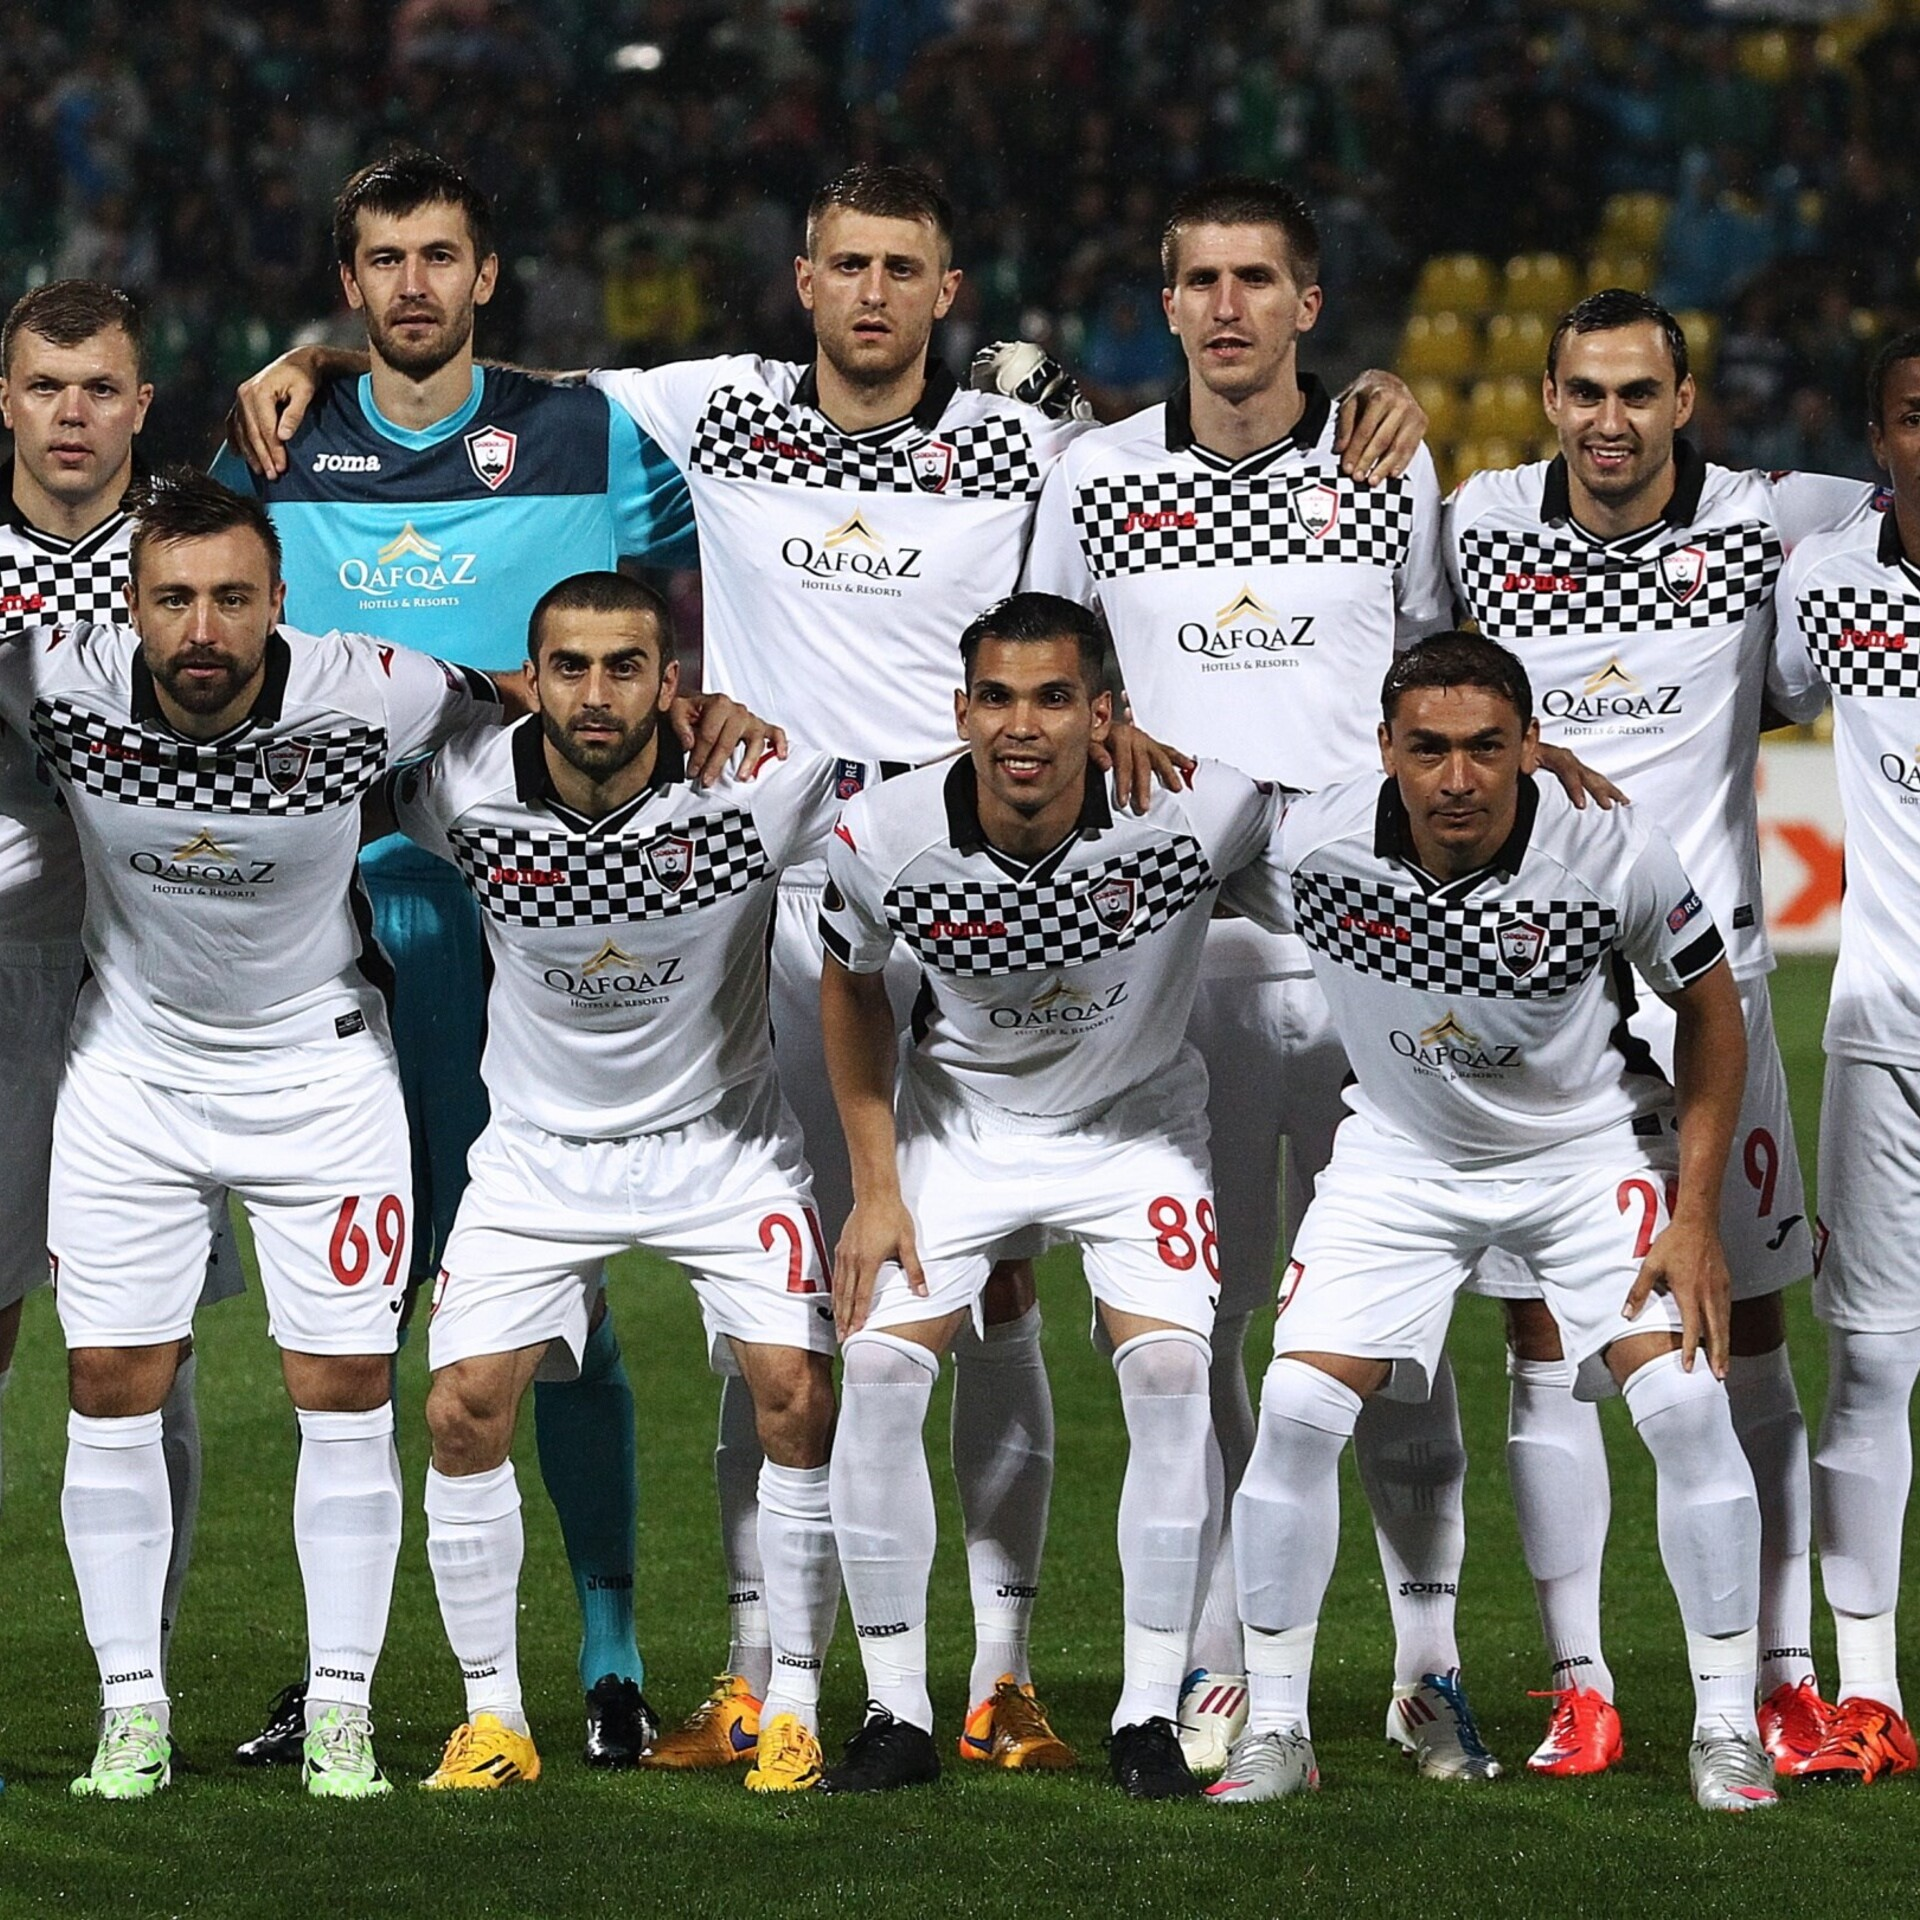 6c88a191592 Zenjovi koduklubi sai võrdsete heitluses valusa kaotuse   Jalgpall   ERR